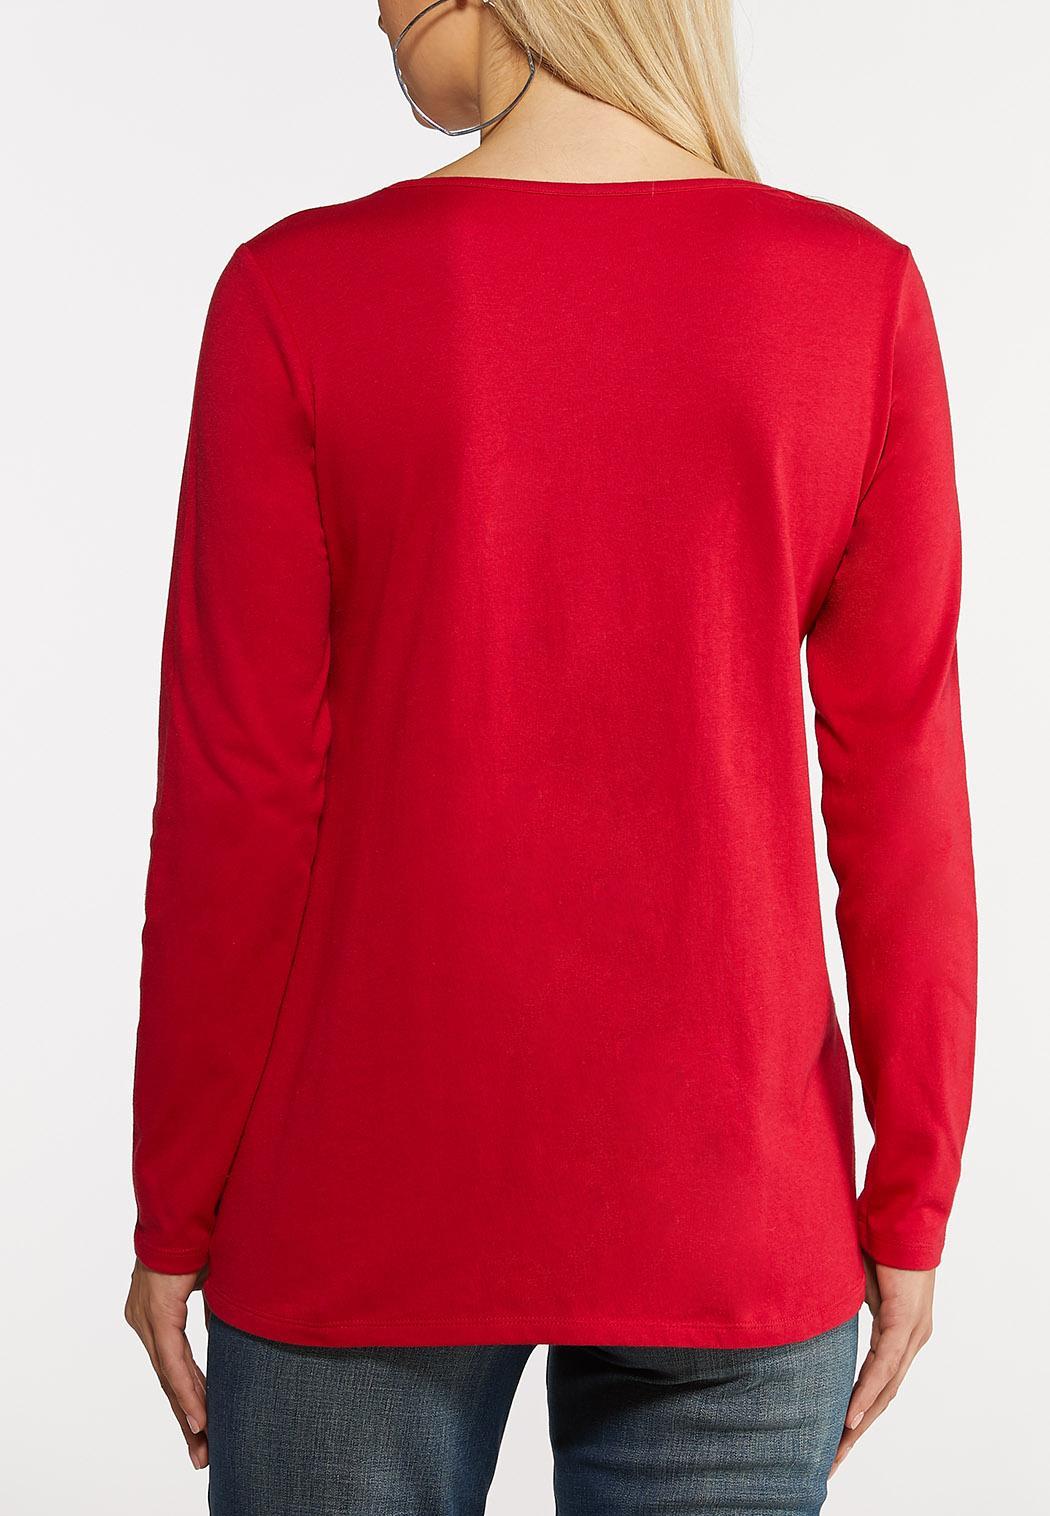 Plus Size Who Needs Mistletoe Top (Item #44077359)